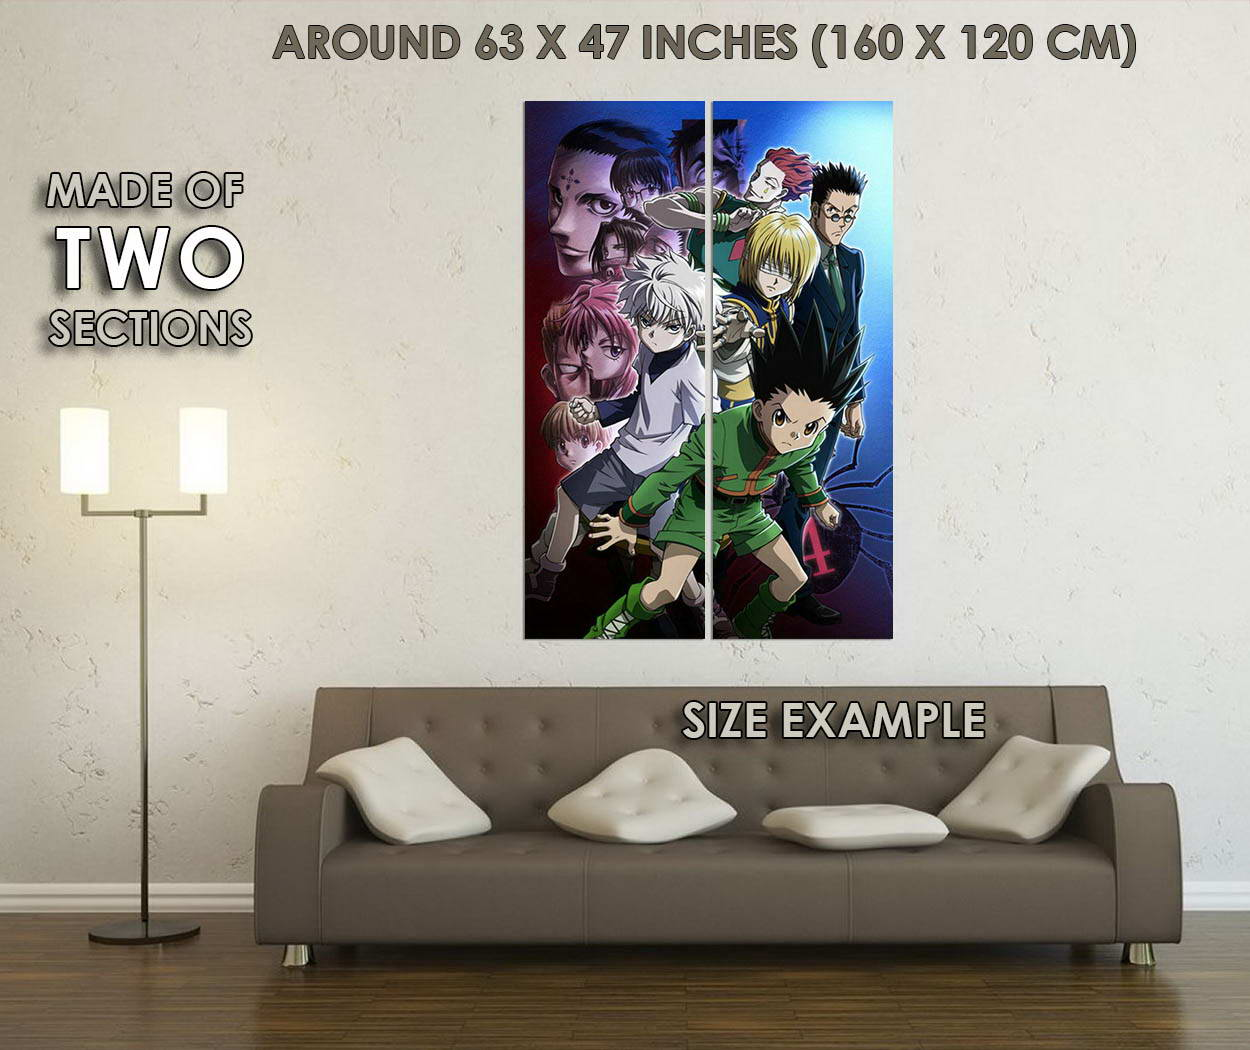 10489-Hunter-x-Hunter-Anime-Killua-Zoldyck-GON-FREECSS-LAMINATED-POSTER-CA thumbnail 6